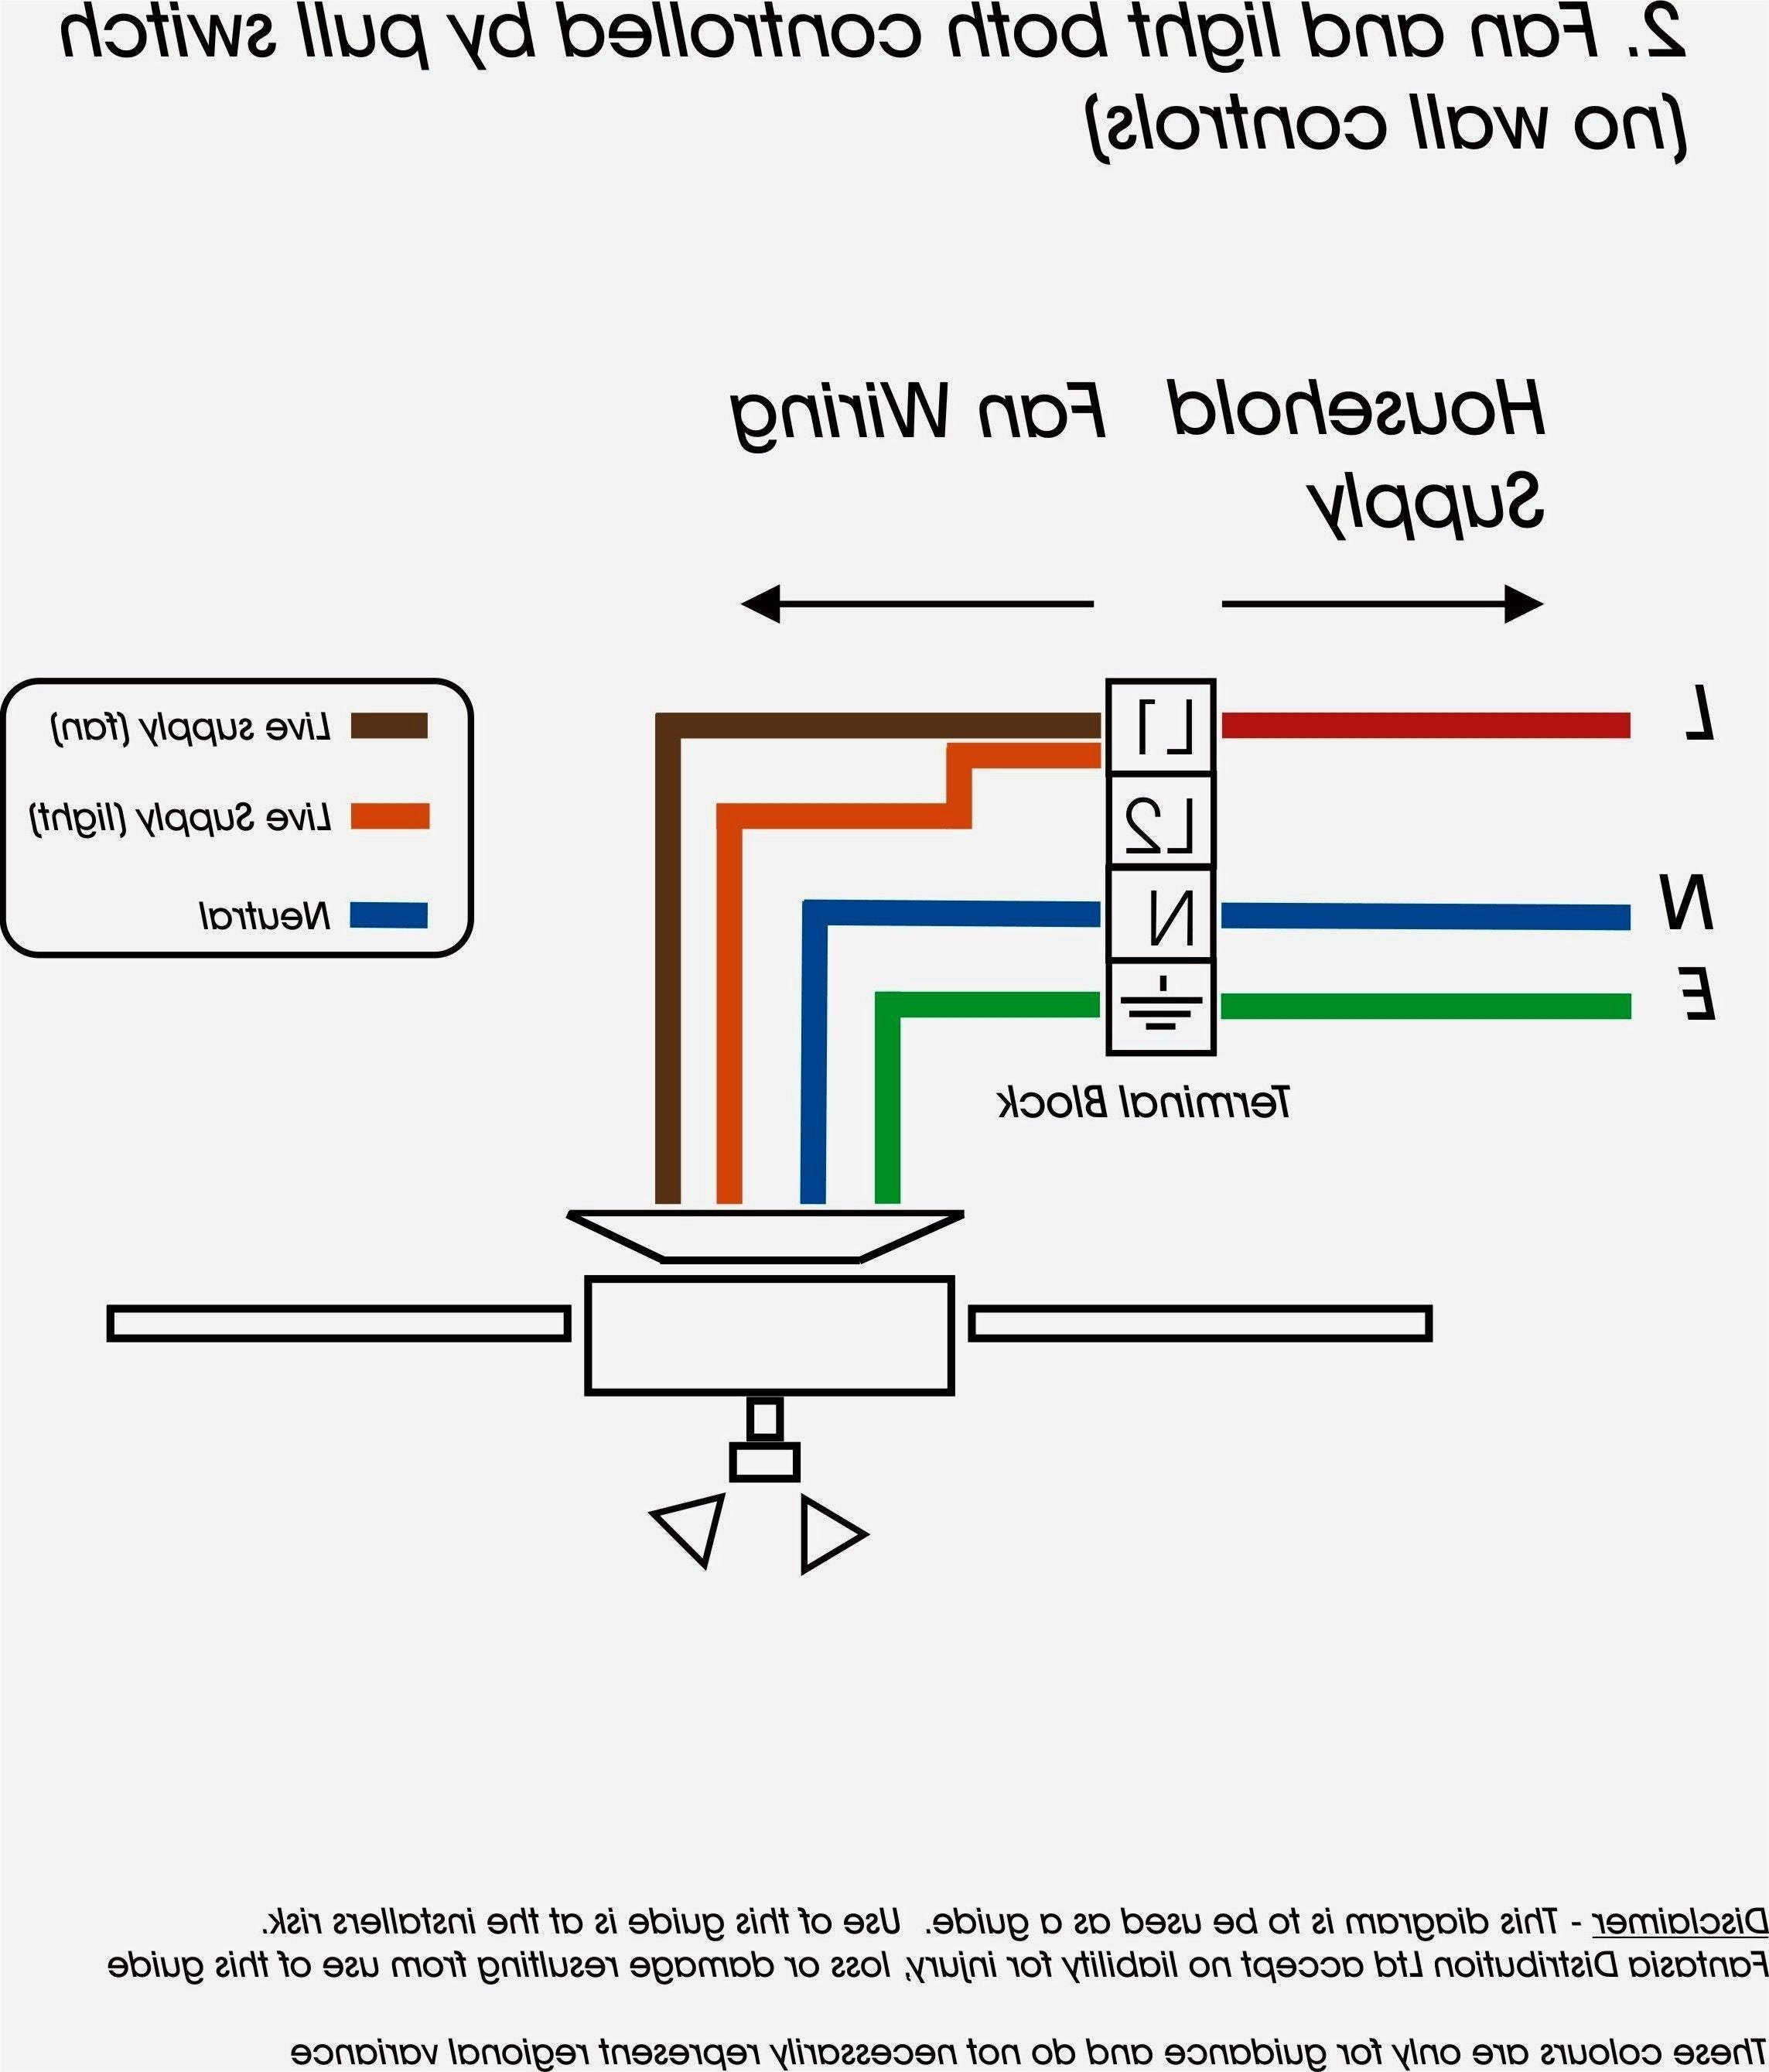 7 Wire Trailer Plug Diagram 5 Wire Trailer Plug Diagram Valid Wiring Diagram for 5 Pin Trailer Of 7 Wire Trailer Plug Diagram